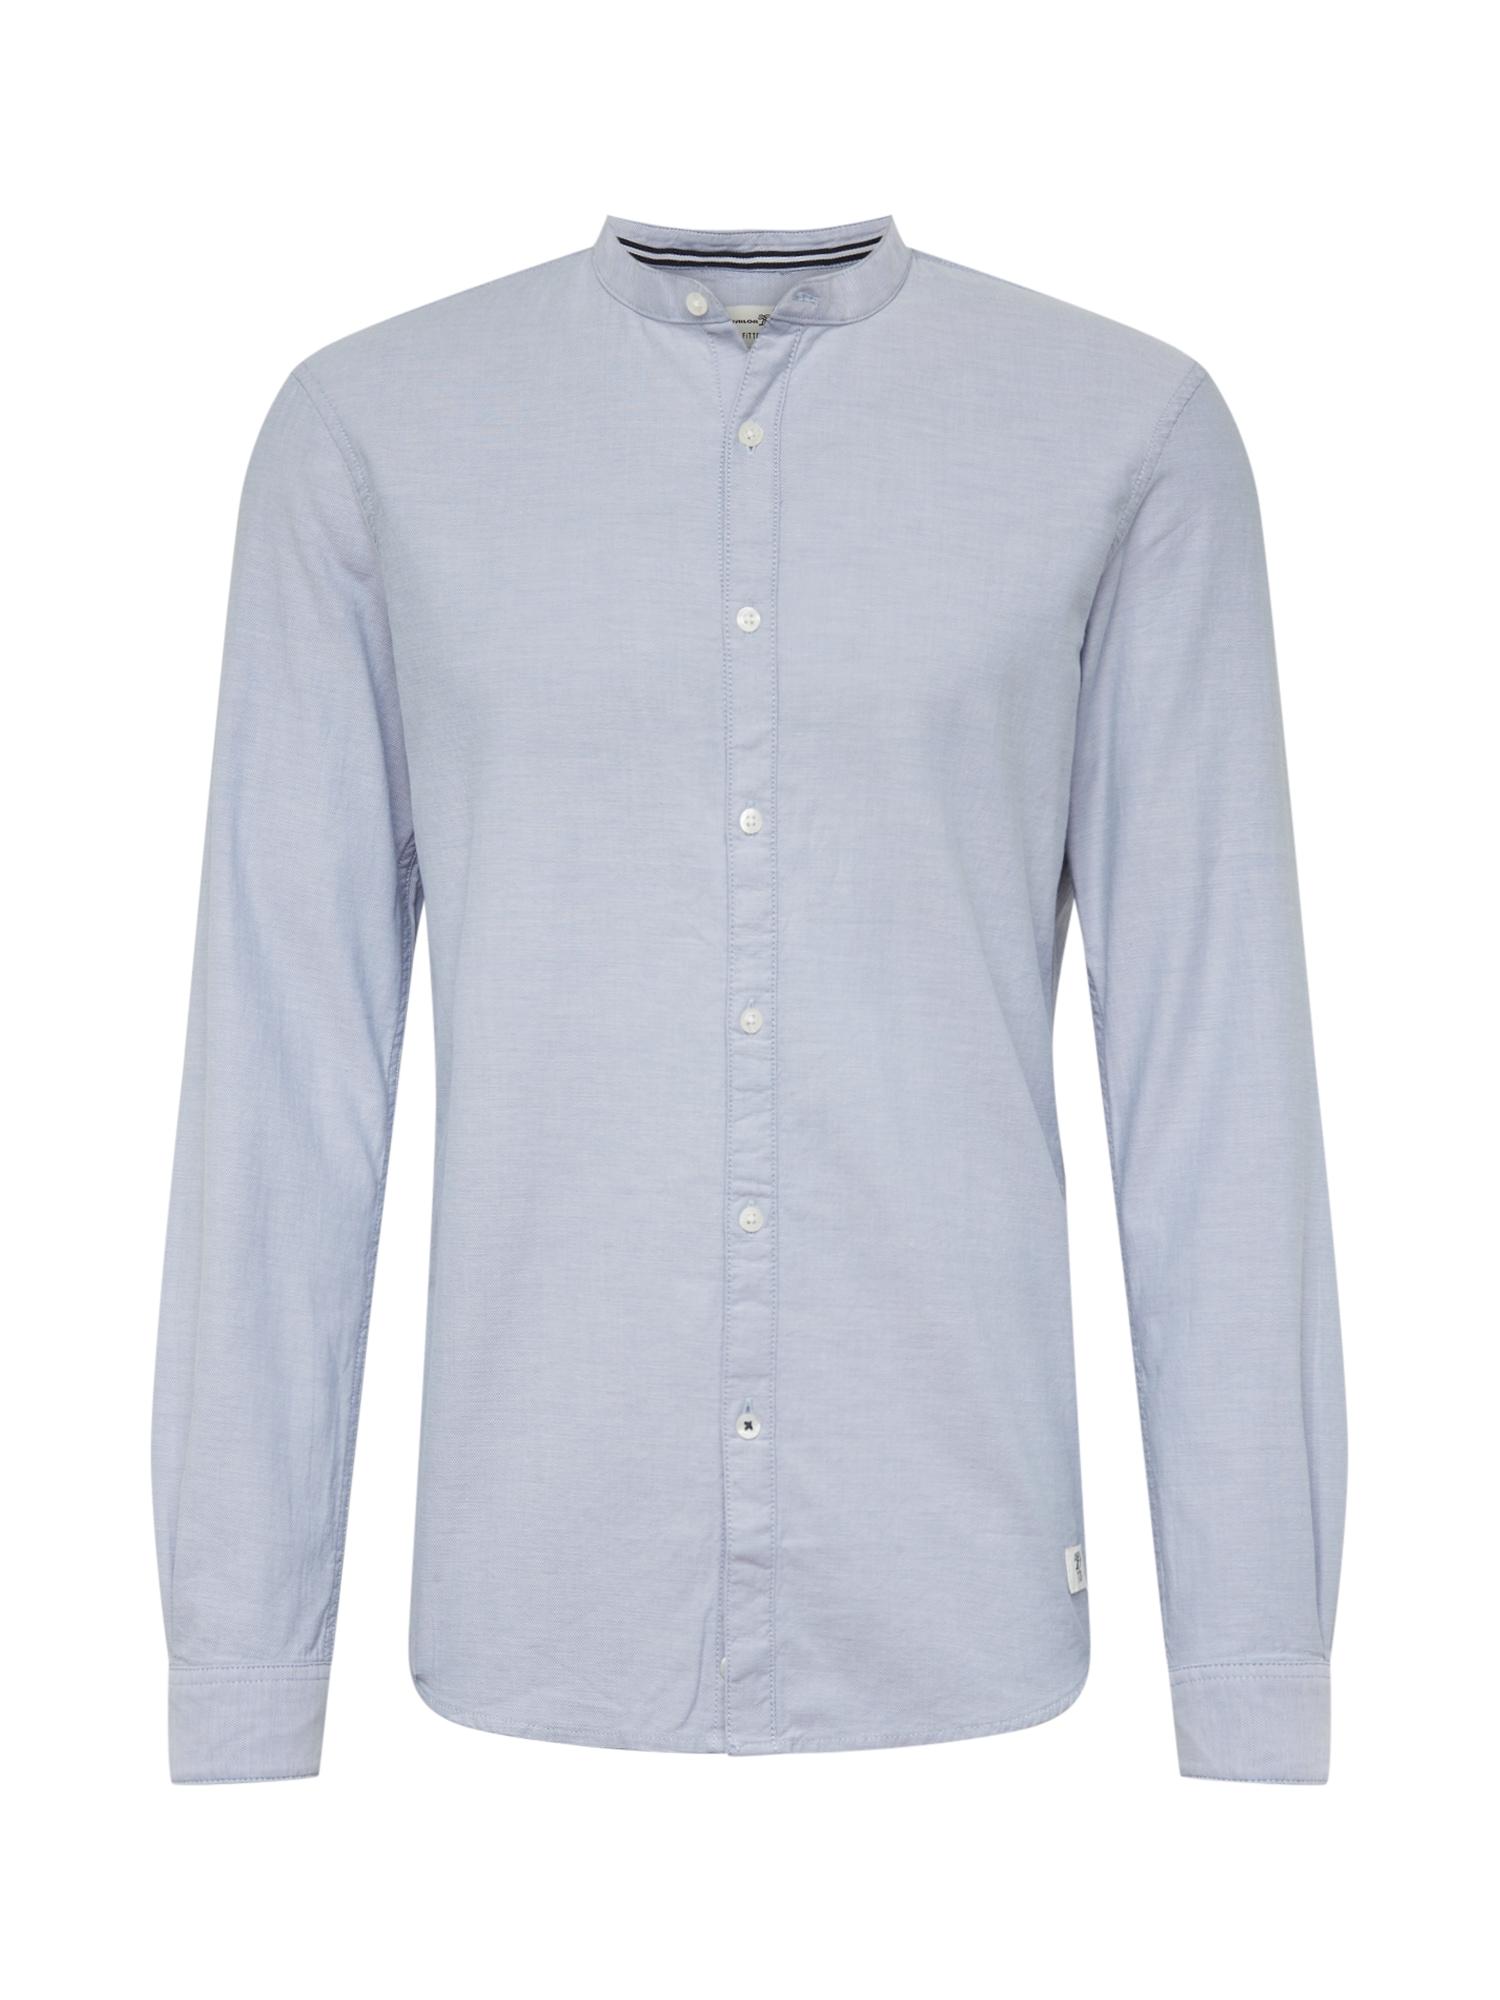 TOM TAILOR DENIM Společenská košile  modrá